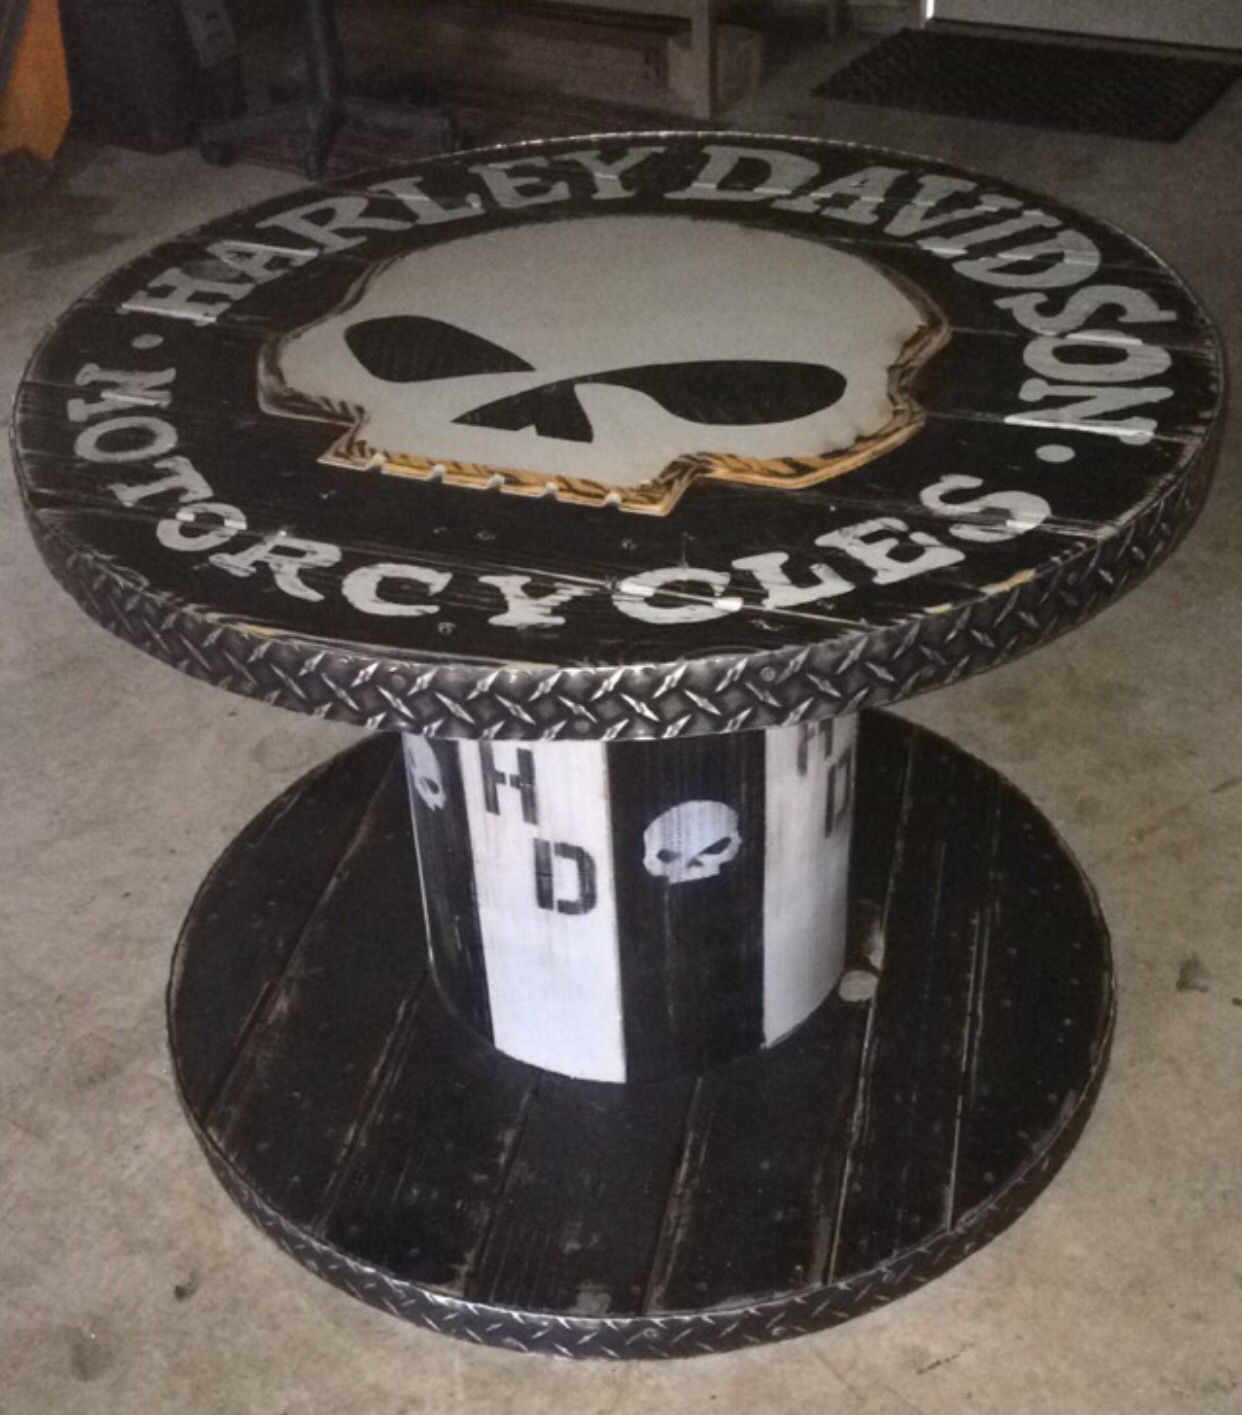 Wooden Spool Harley Davidson Table | HARLEY DAVIDSON/Motorcycles ...